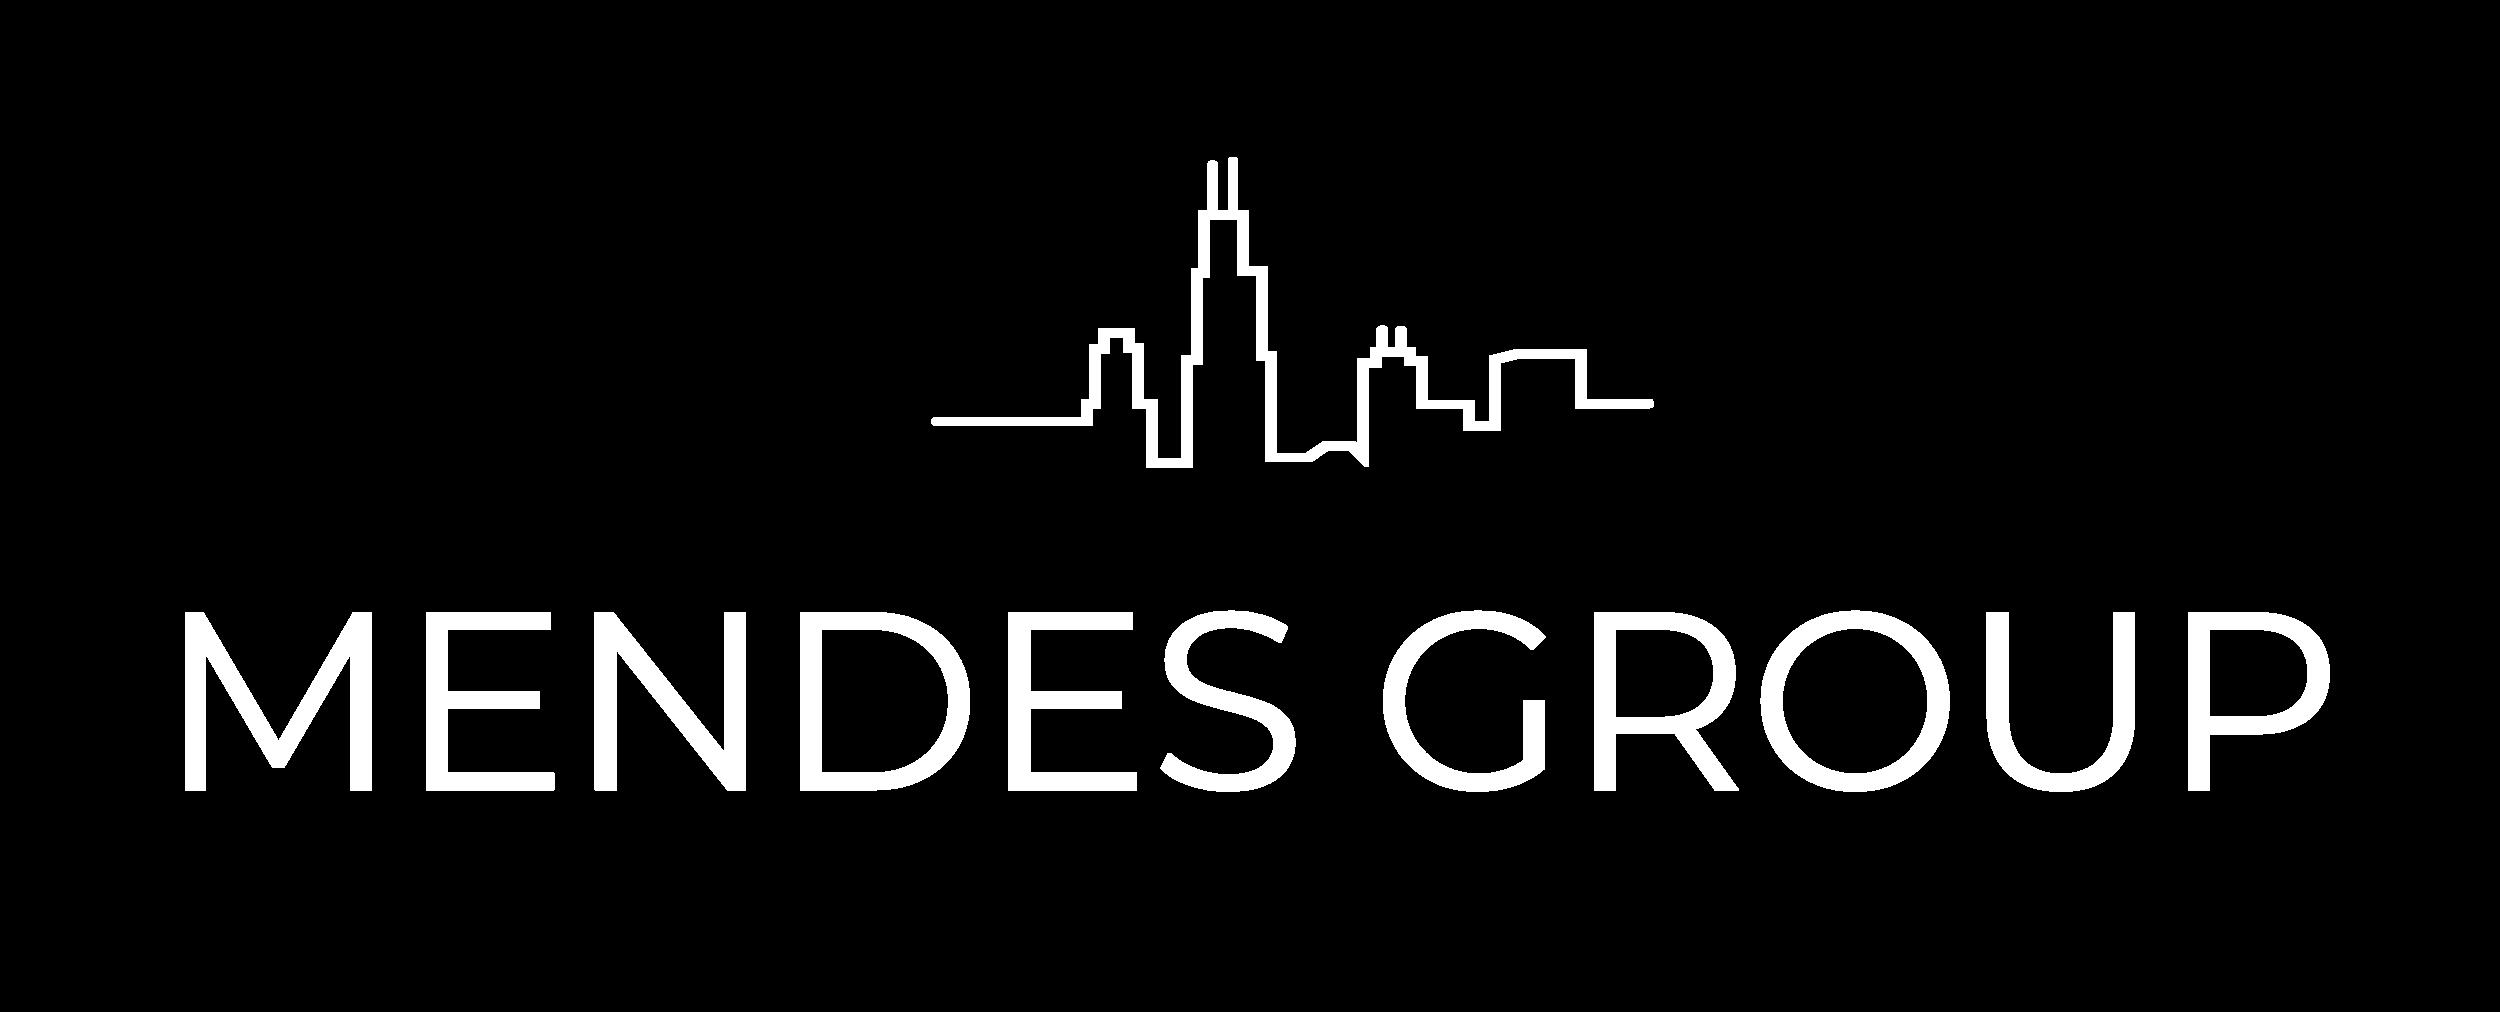 MENDES GROUP-logo-white5000.png